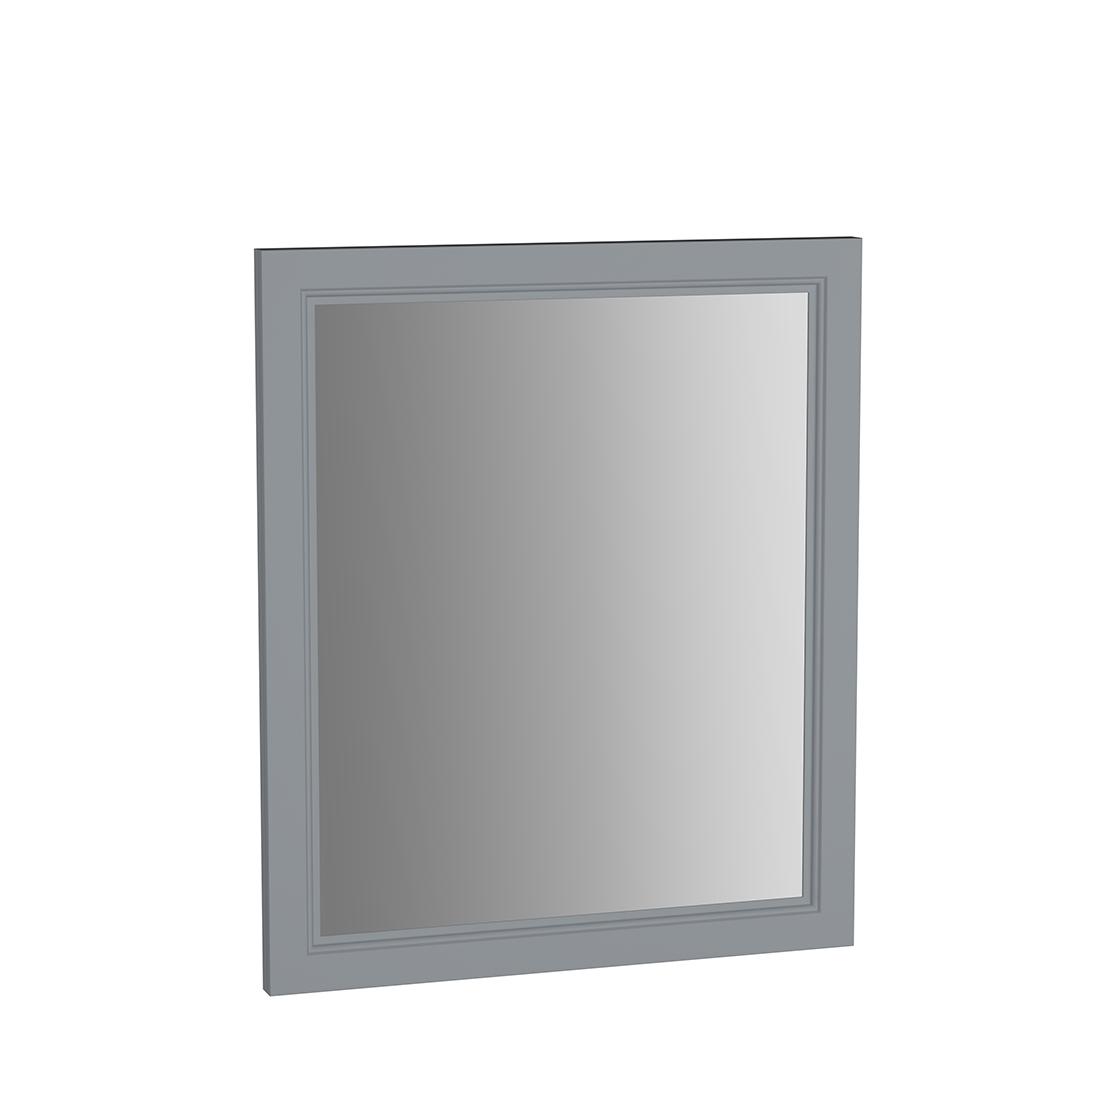 Valarte miroir, 65 cm, gris mat